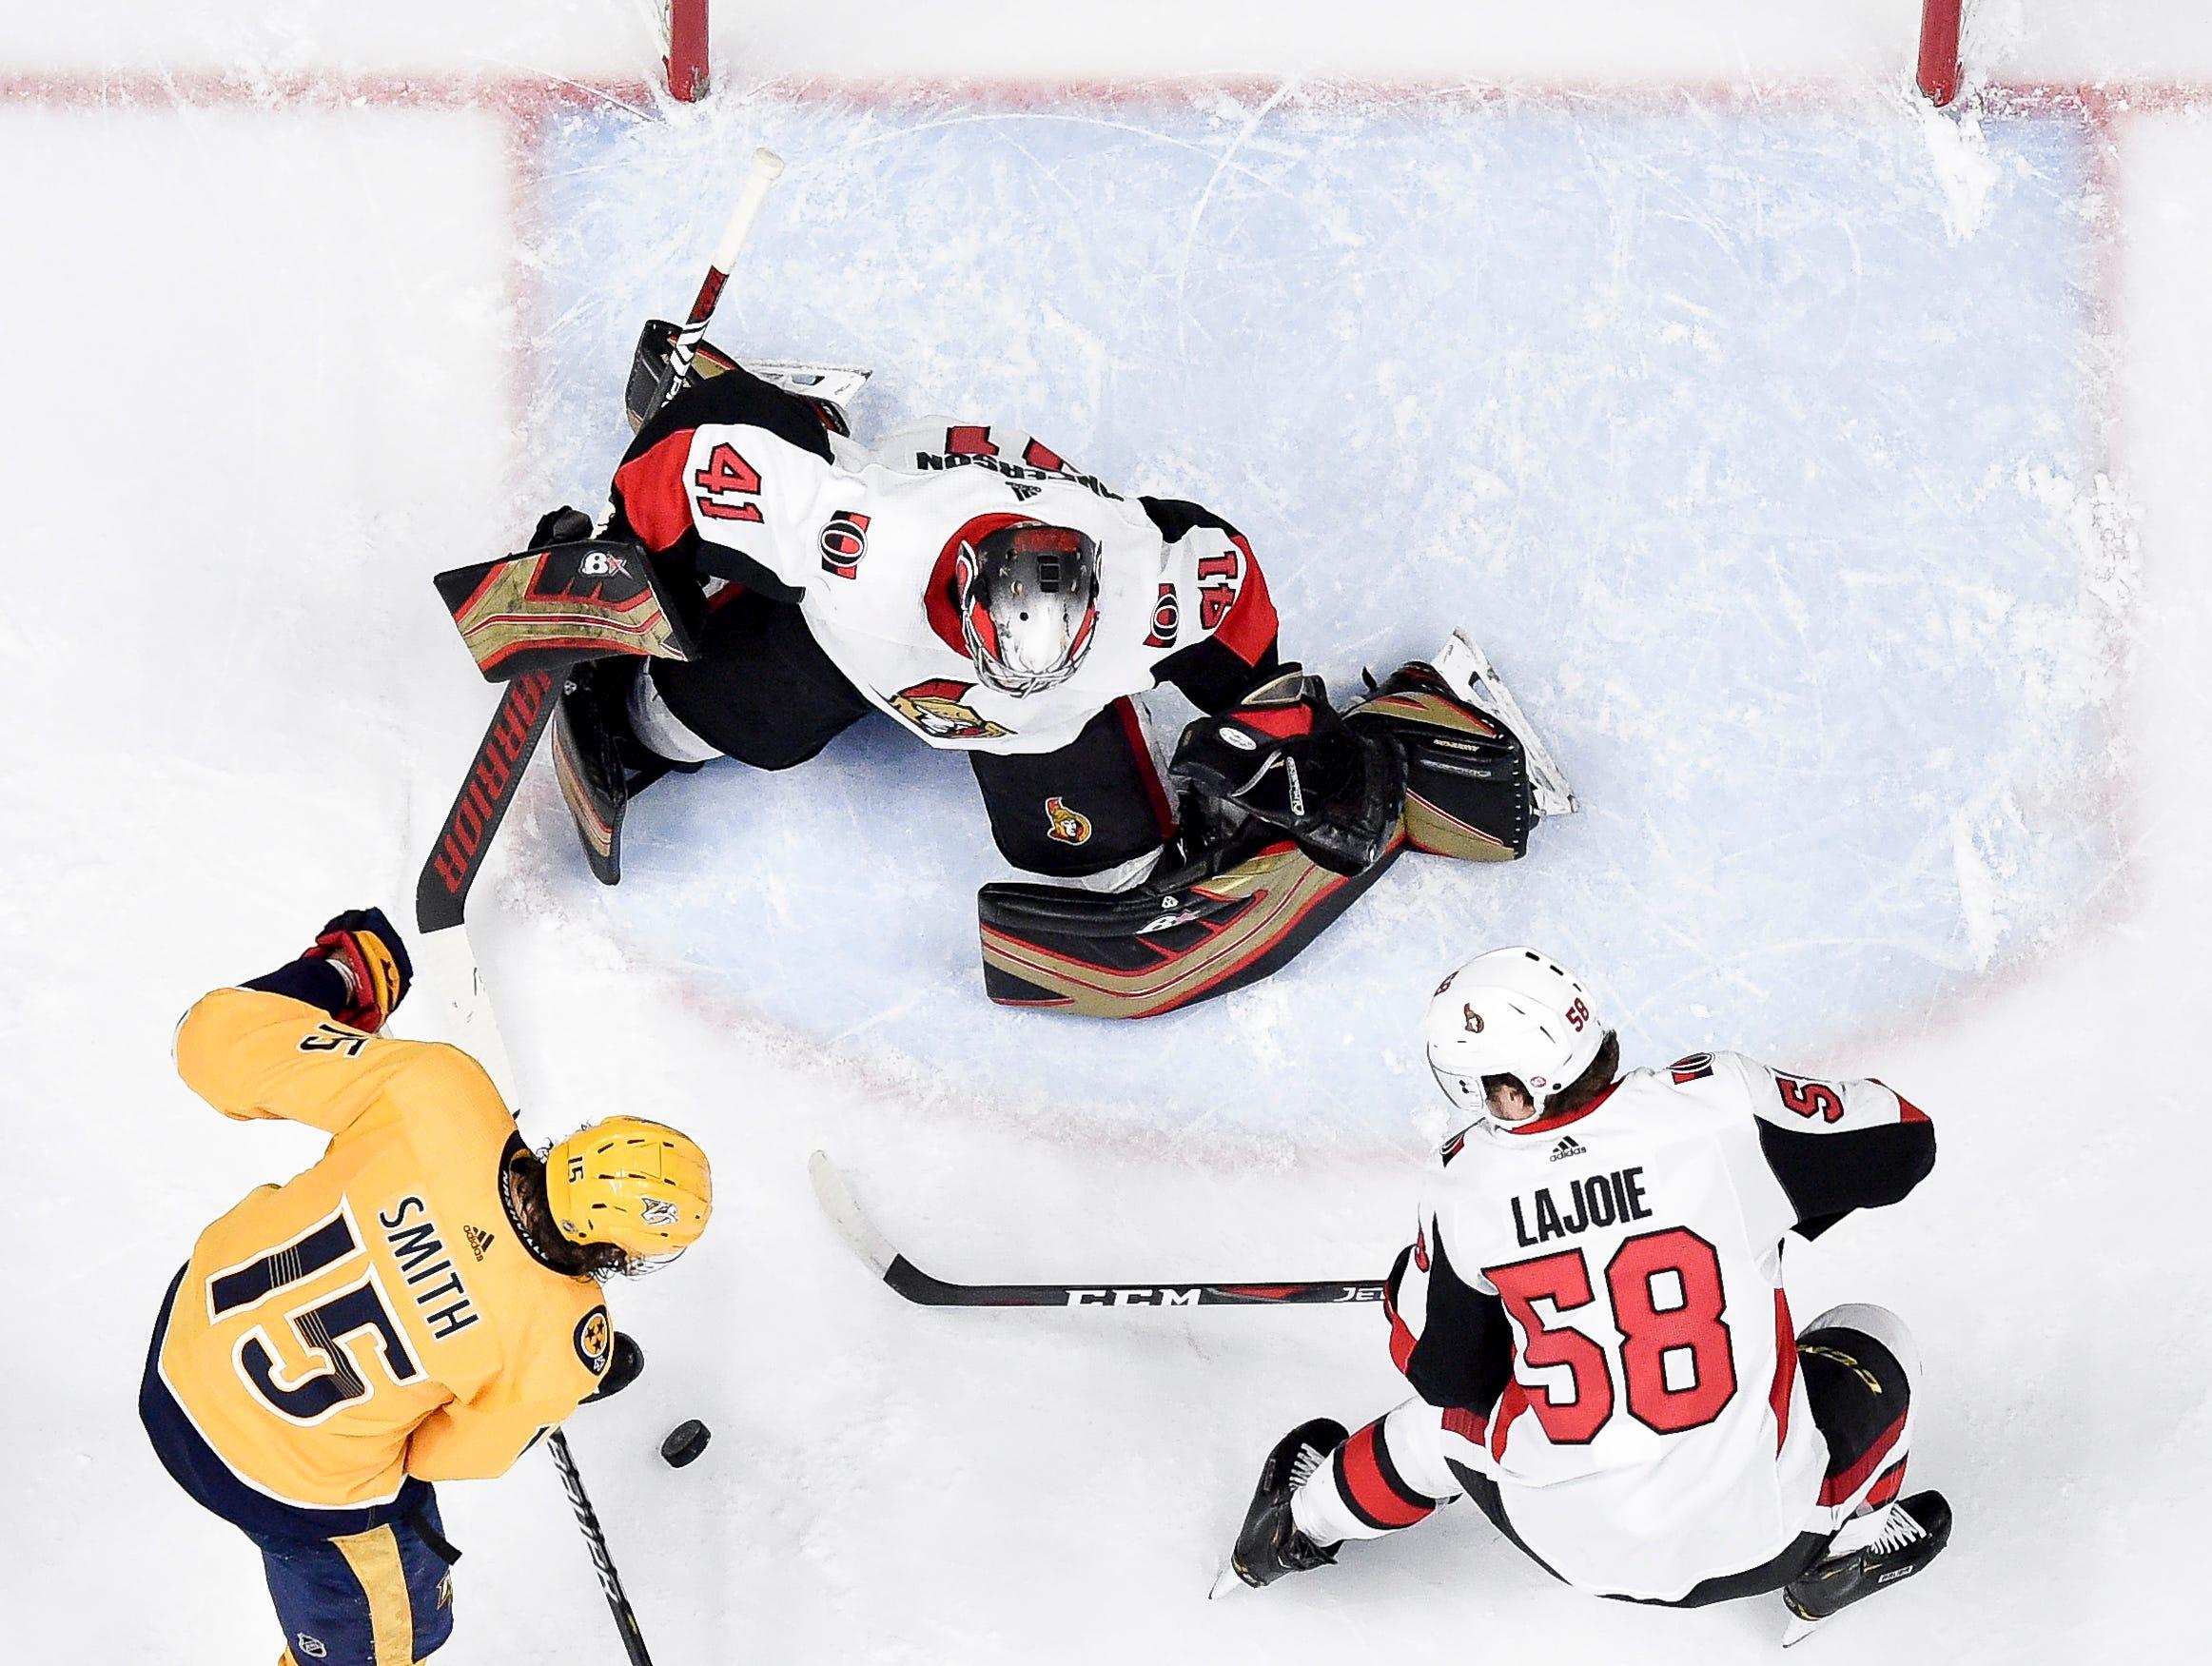 Nashville Predators right wing Craig Smith (15) battles with Ottawa Senators goaltender Craig Anderson (41) and defenseman Maxime Lajoie (58) during the second period at Bridgestone Arena in Nashville, Tenn., Tuesday, Dec. 11, 2018.